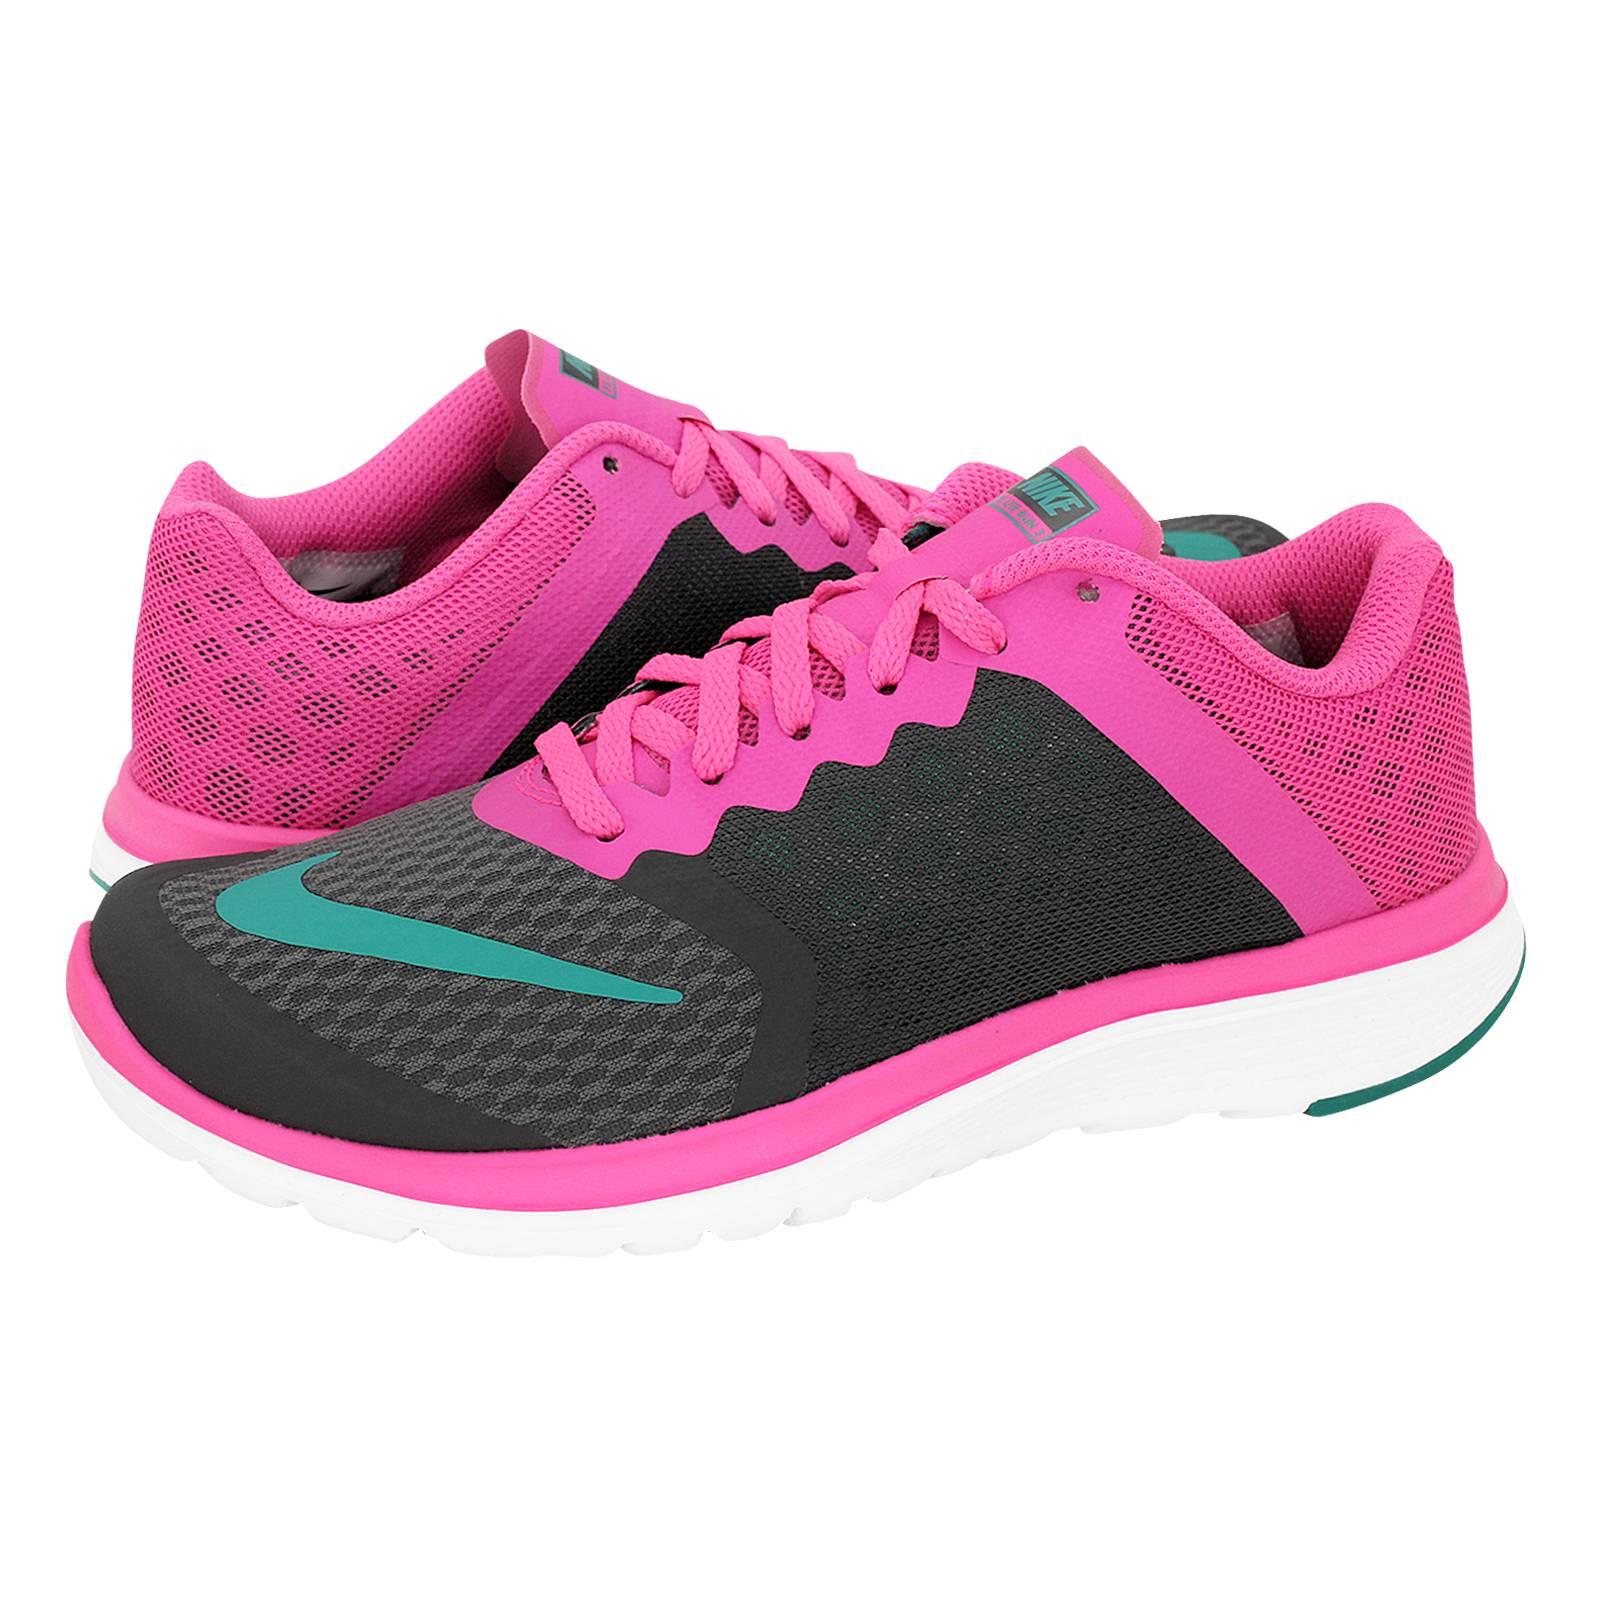 new style feb28 ffe29 Nike FS Lite Run 3 athletic shoes